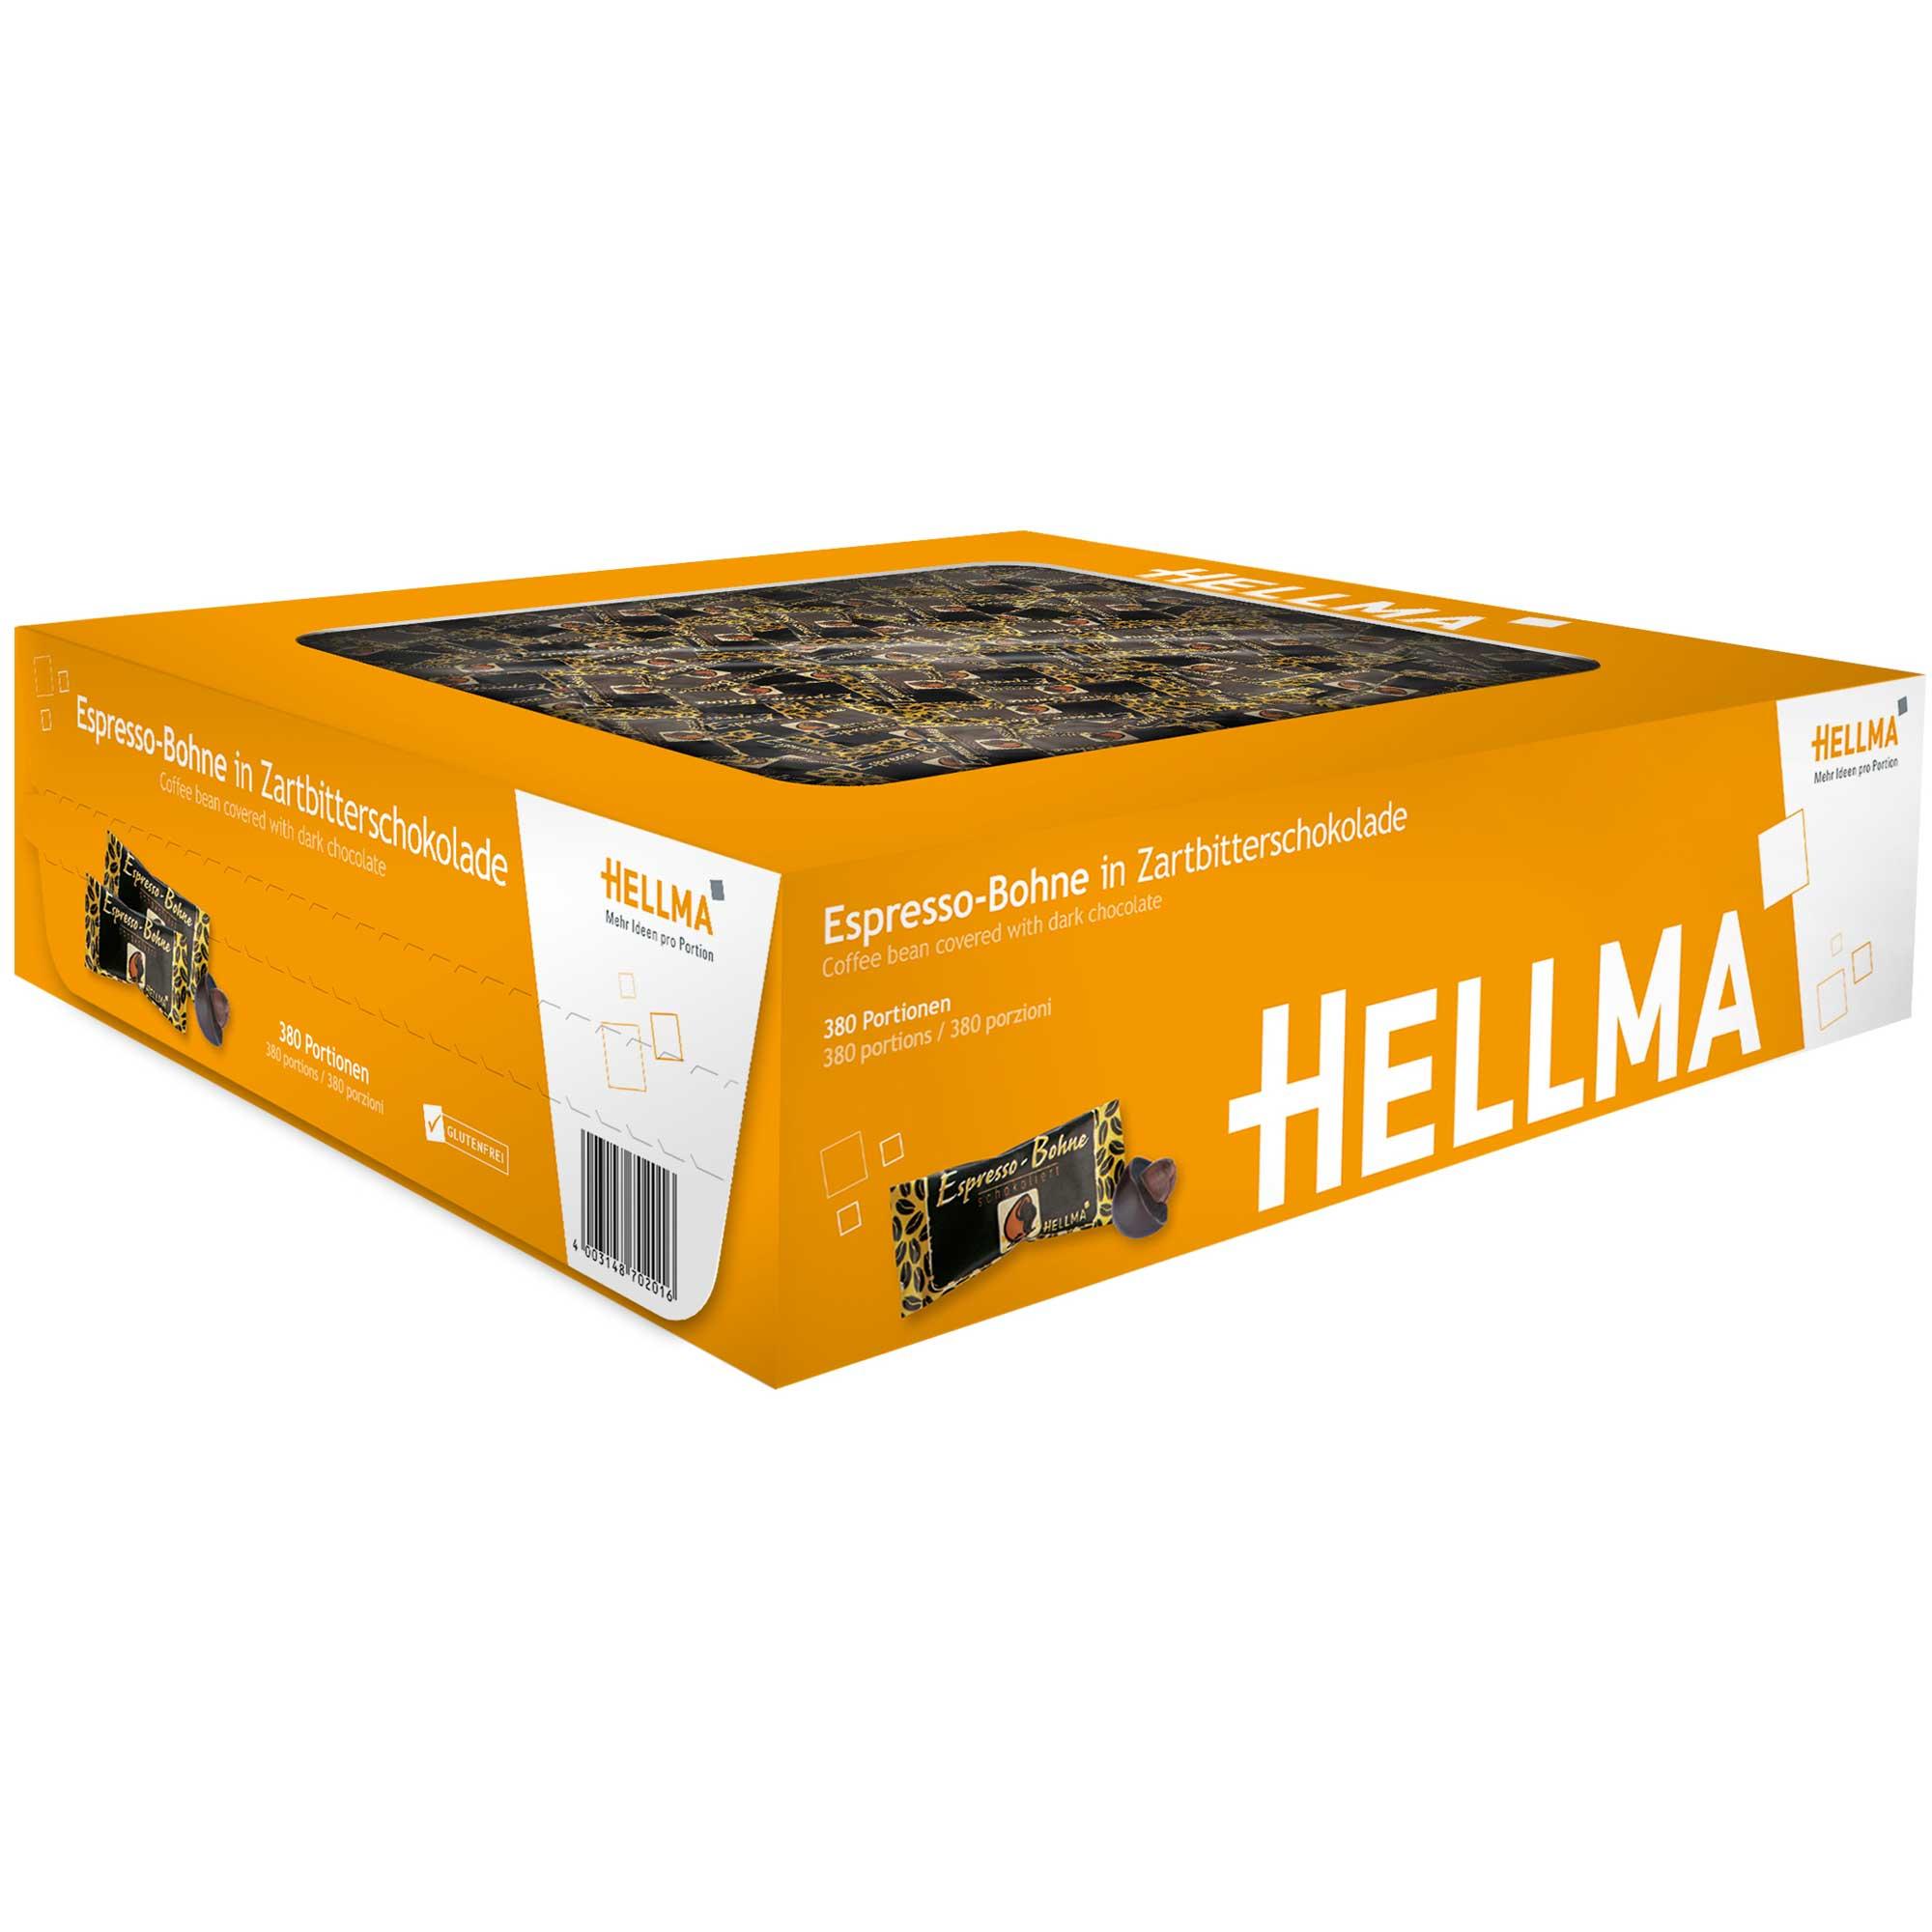 hellma espresso bohne in zartbitterschokolade 380er online kaufen im world of sweets shop. Black Bedroom Furniture Sets. Home Design Ideas